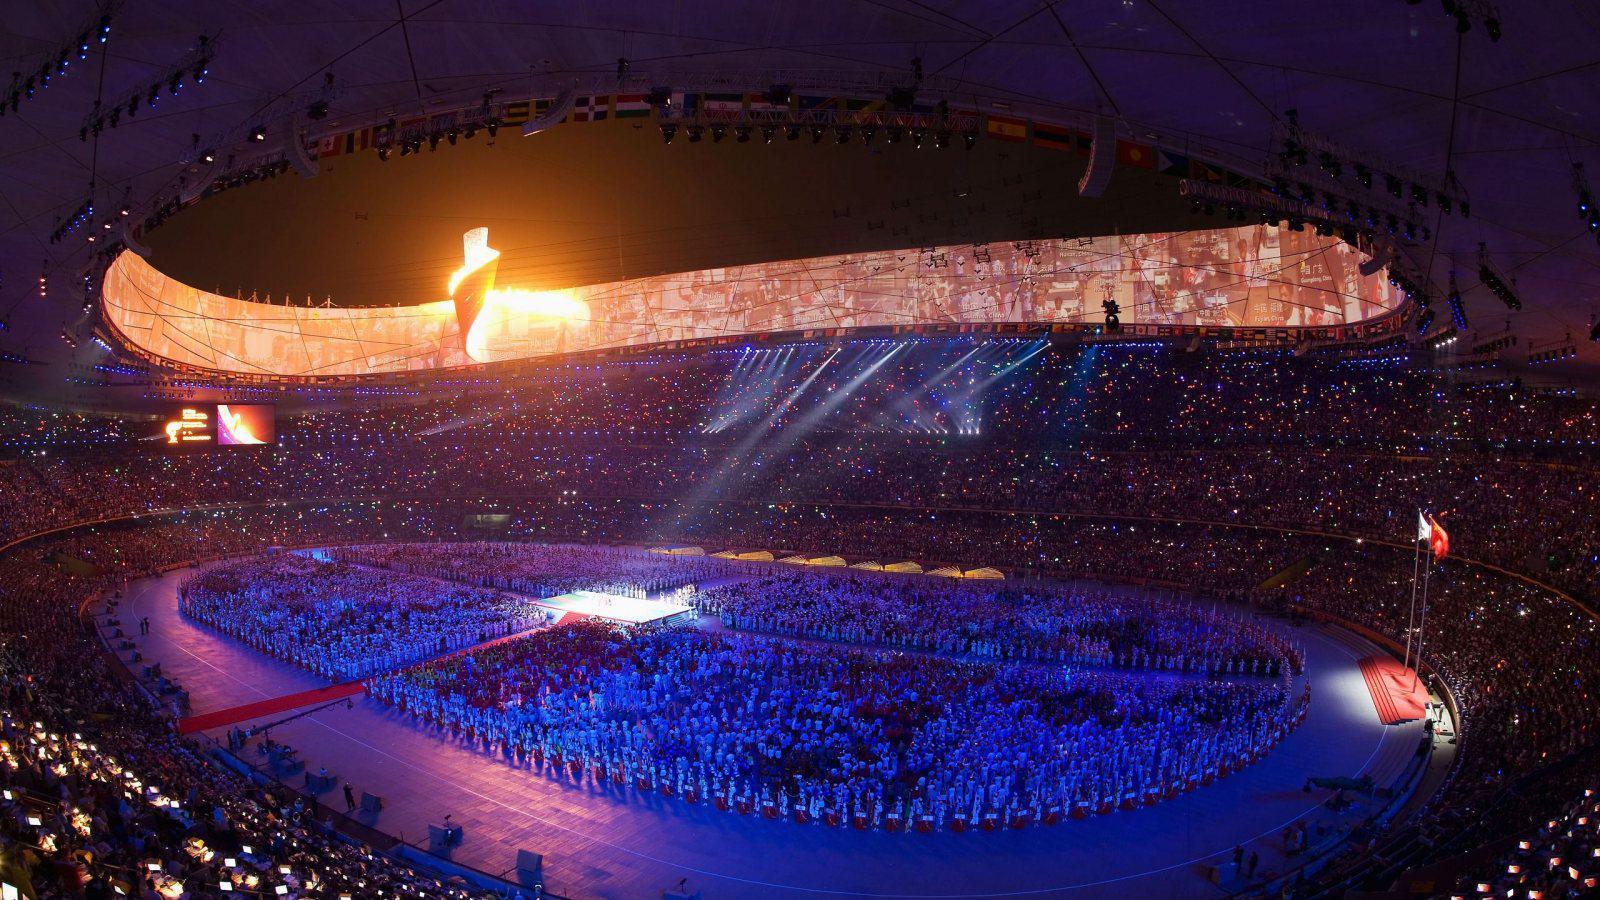 http://3.bp.blogspot.com/-4v0_N8yrGDA/T5daLQNiJYI/AAAAAAAABvc/zDtygPFXrsY/s1600/beijing-olympic-games-opening-1600x900_wallpaper.jpg